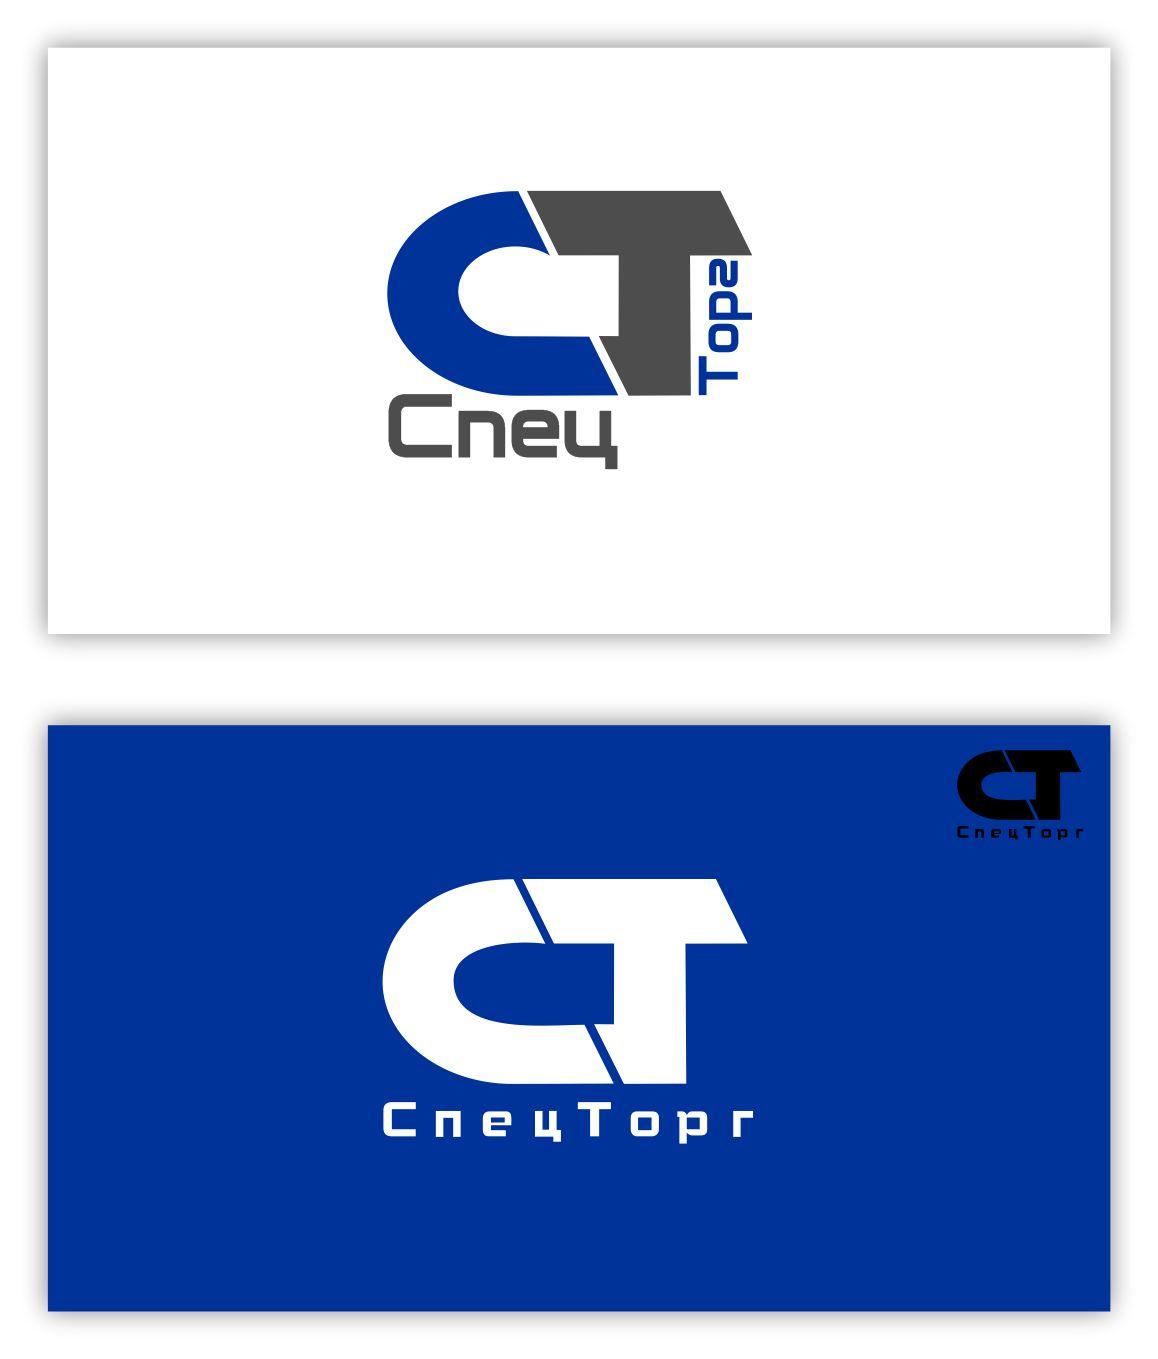 Разработать дизайн  логотипа компании фото f_3585dd00c1caf689.jpg